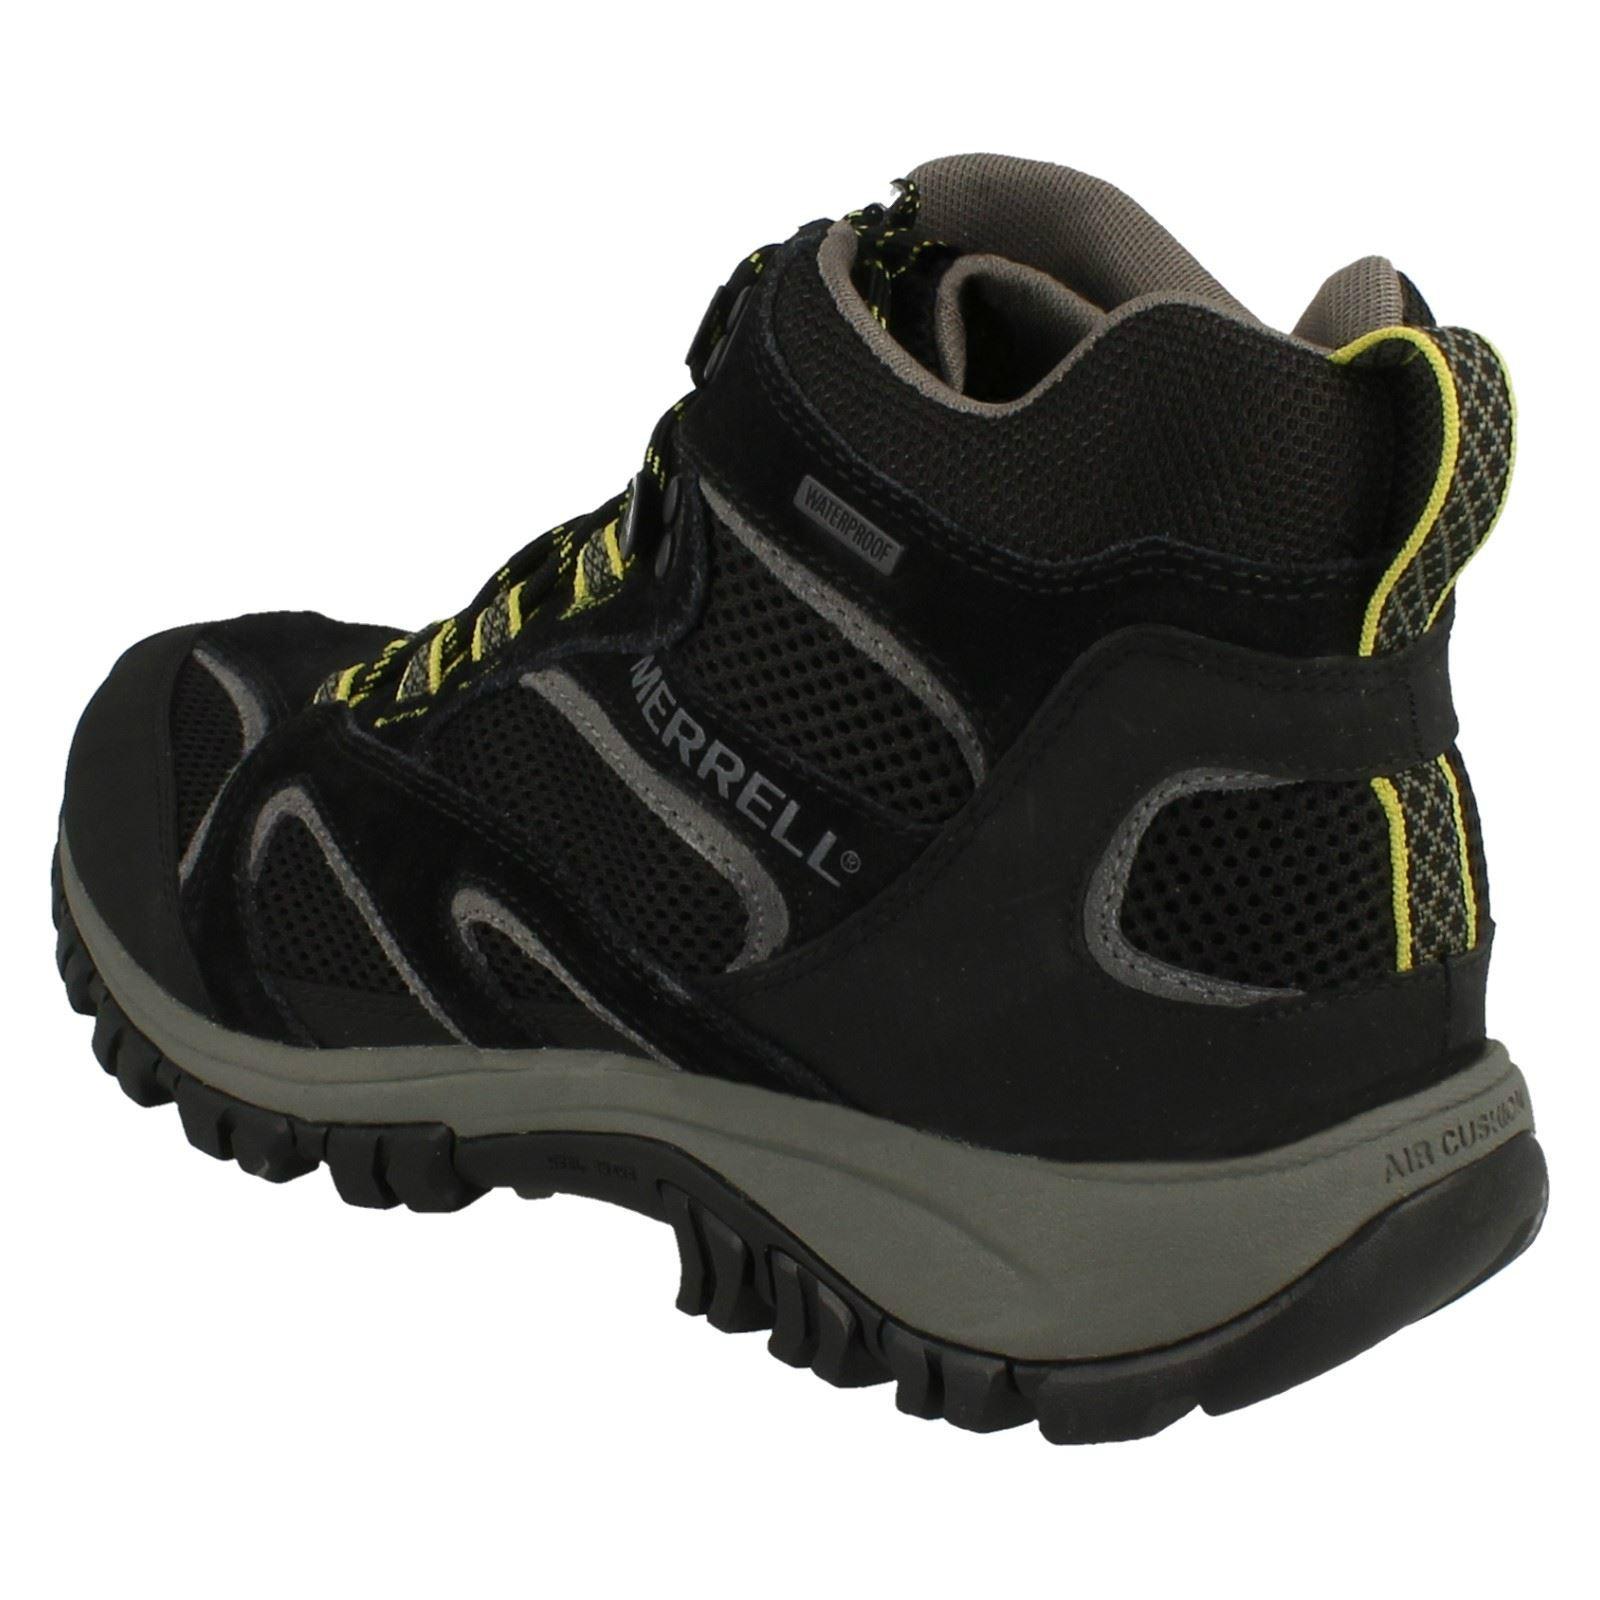 thumbnail 9 - Mens-Merrell-Waterproof-Walking-Boots-Phoenix-Mid